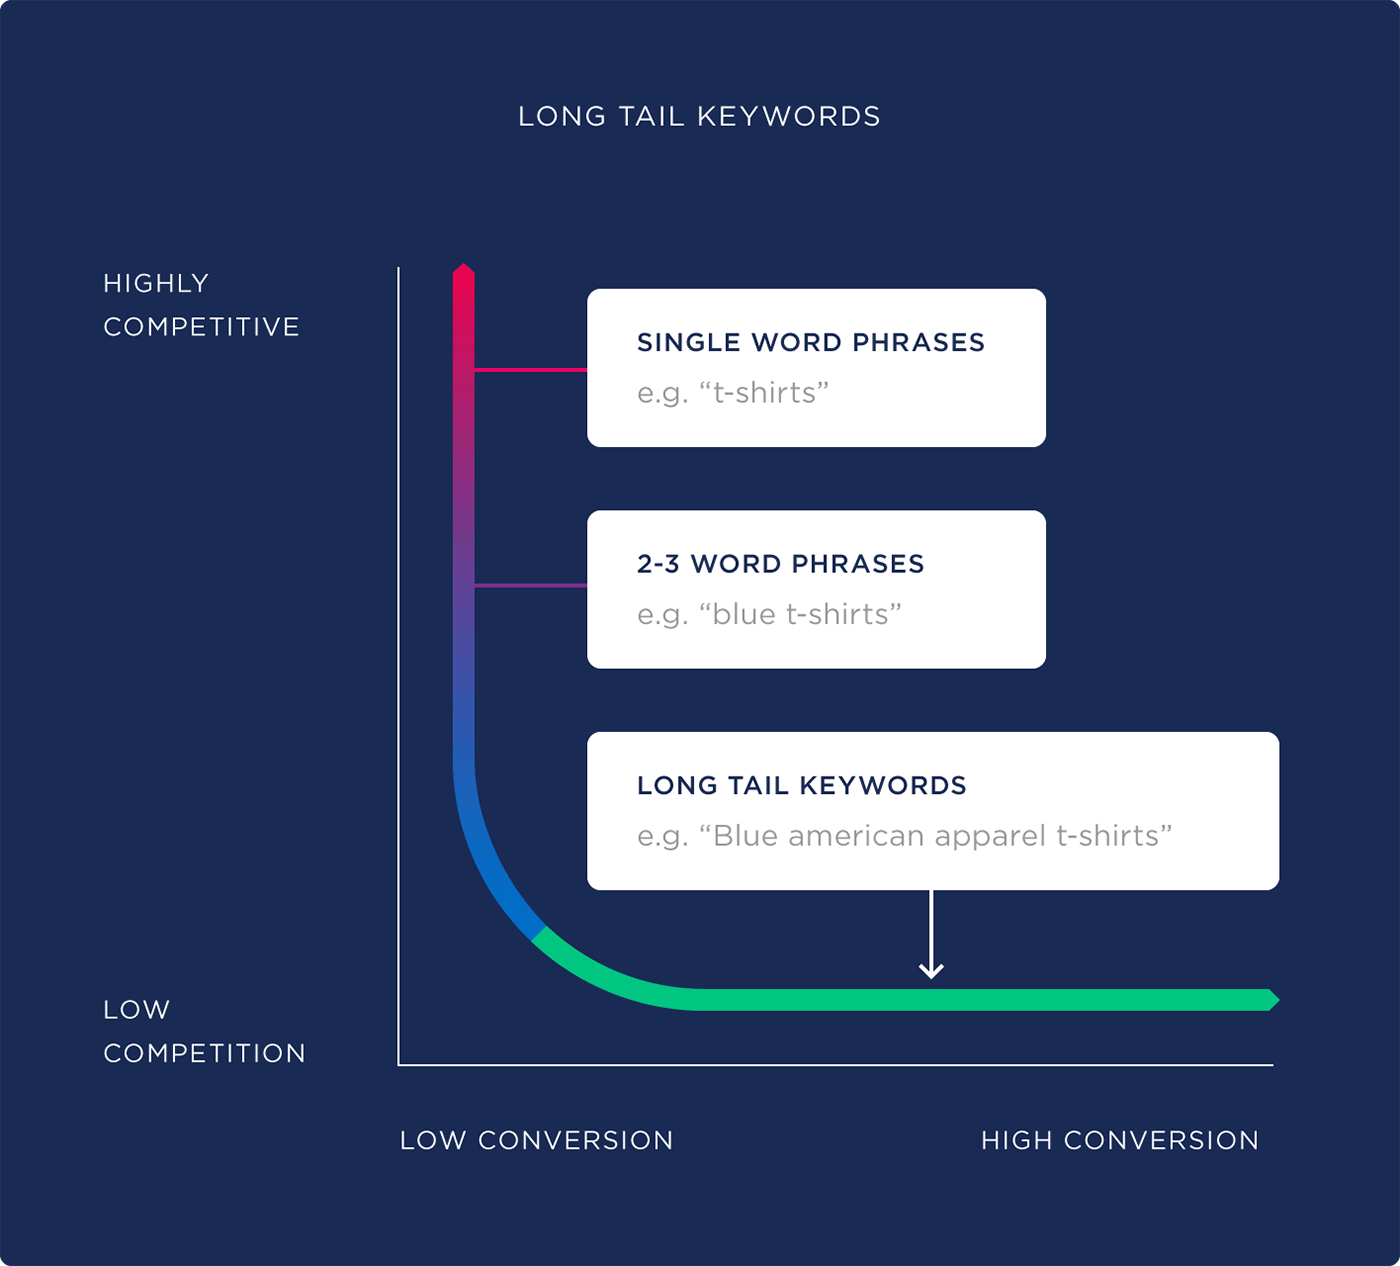 Long Tail Keywords classification.